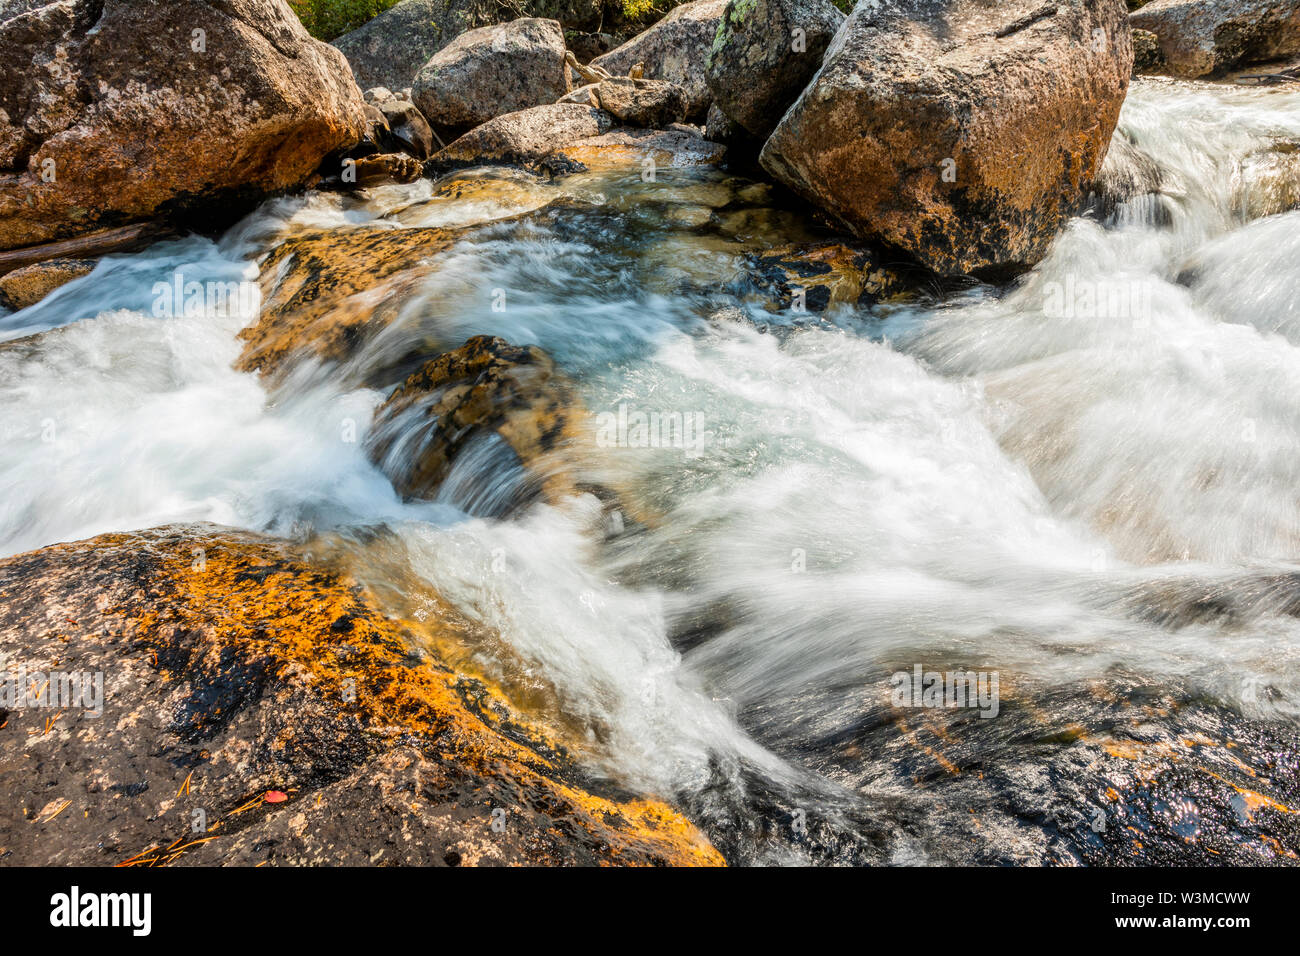 Long exposure of flowing stream in Stanley, Idaho - Stock Image